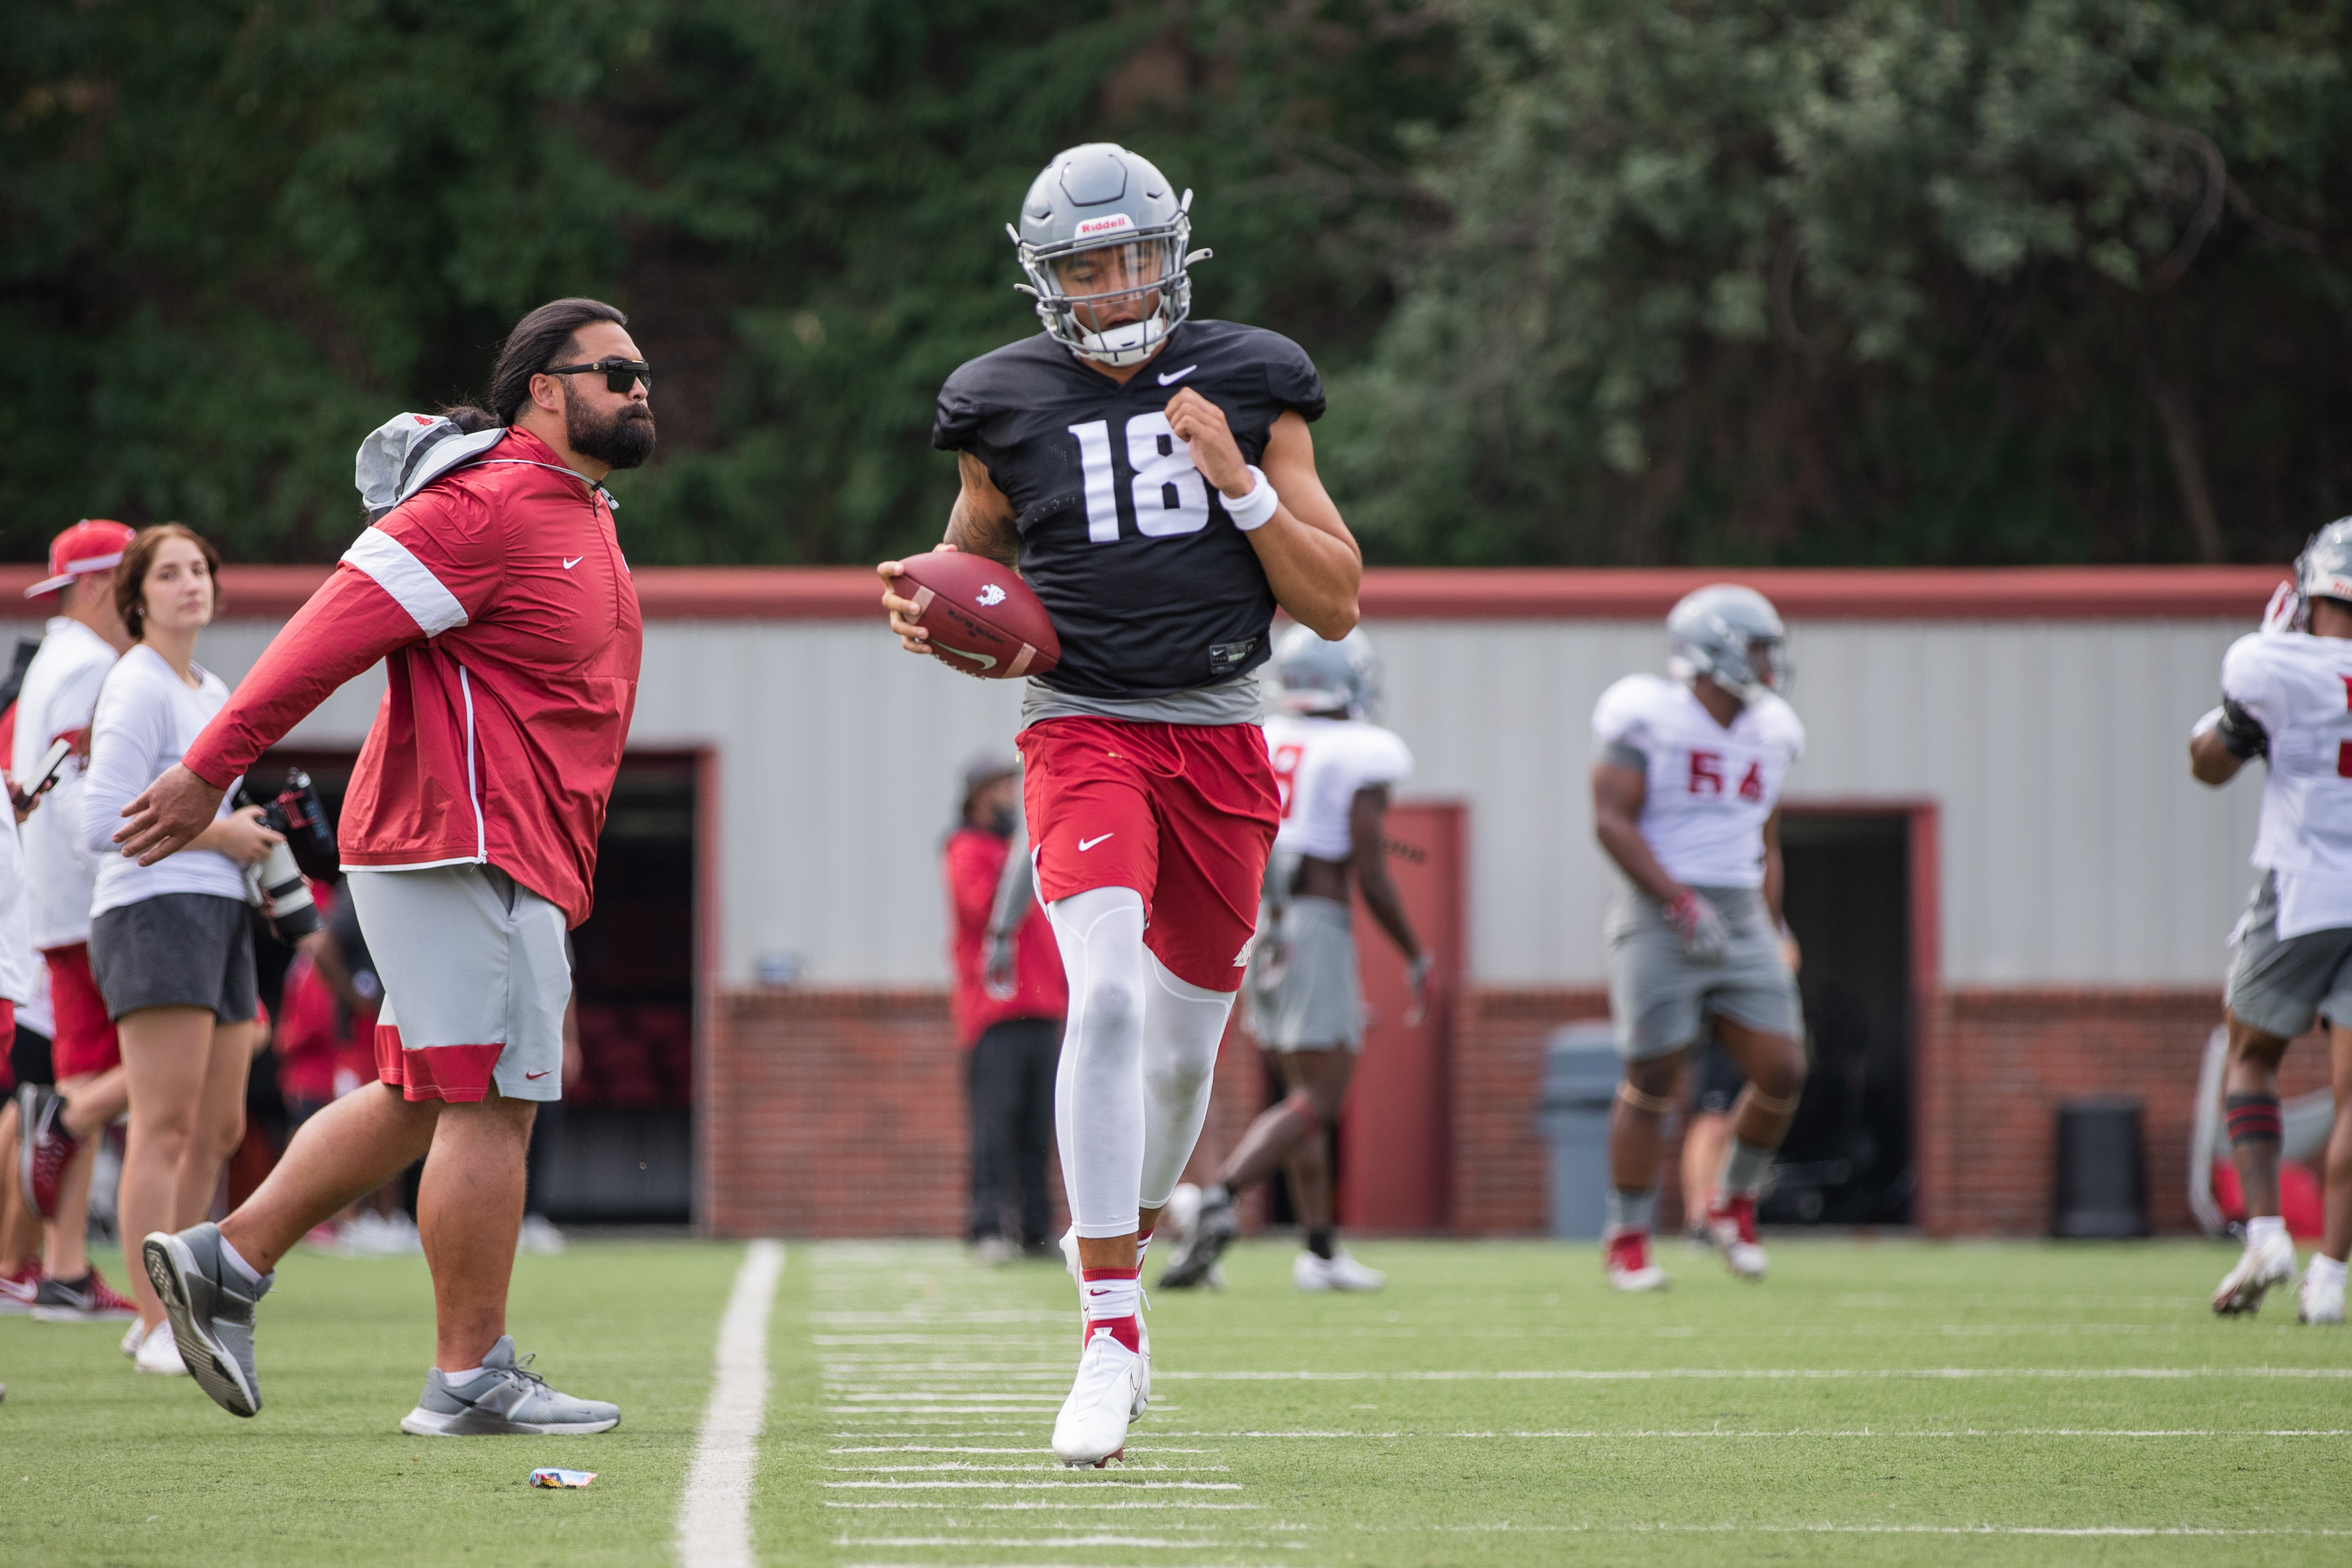 Washington State University Football Fall Practice 4 - Jarrett Guarantano (18)